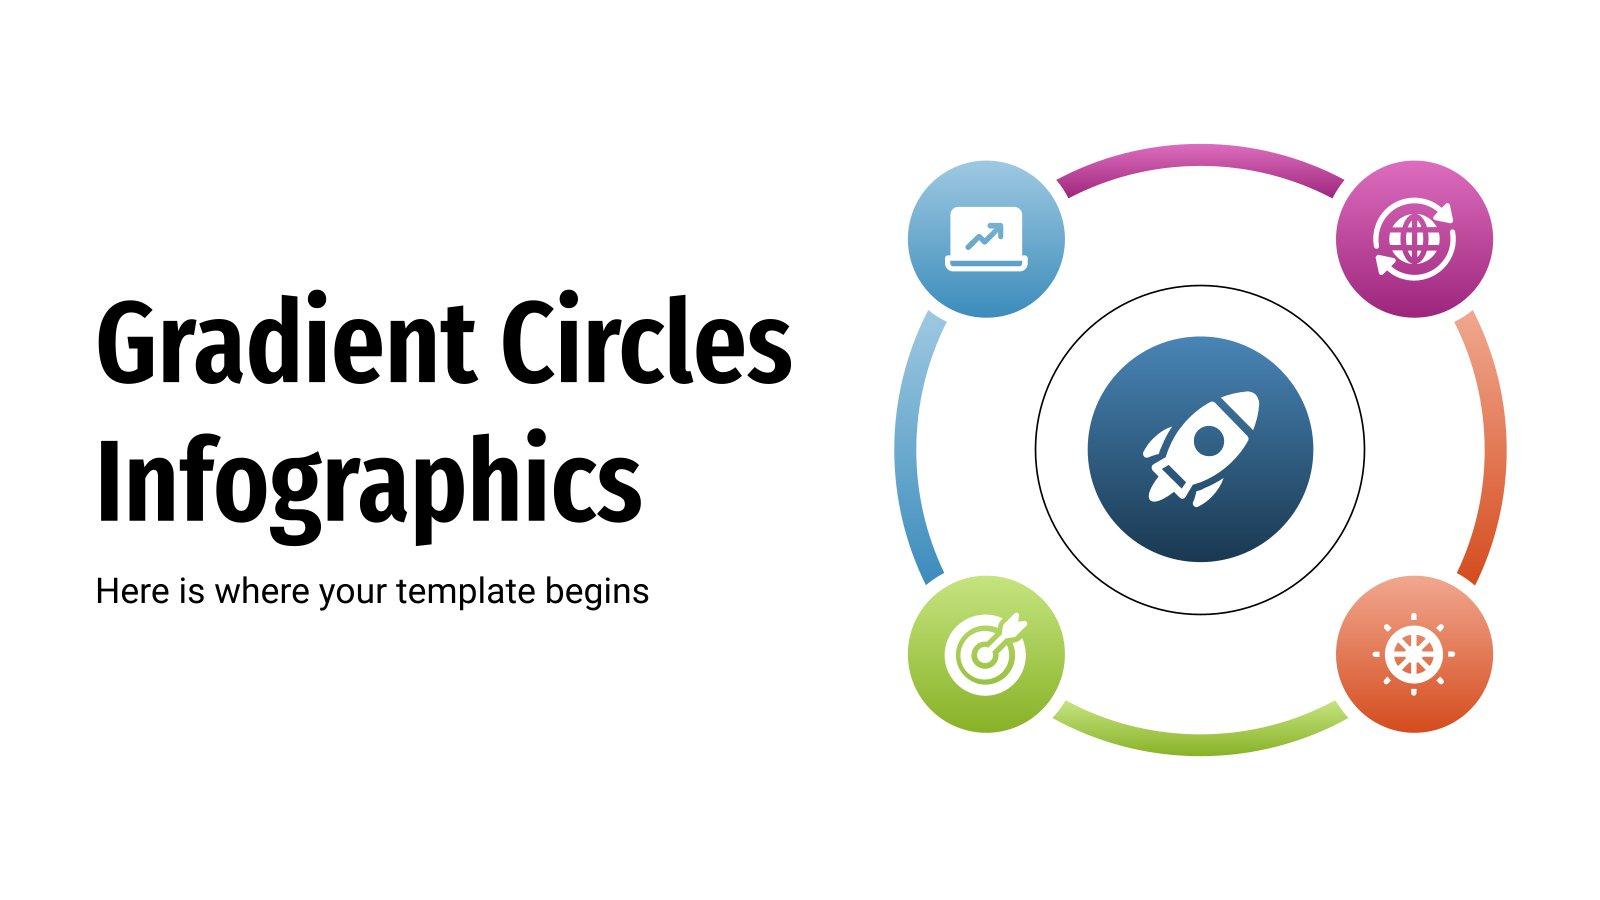 Gradient Circles Infographics presentation template